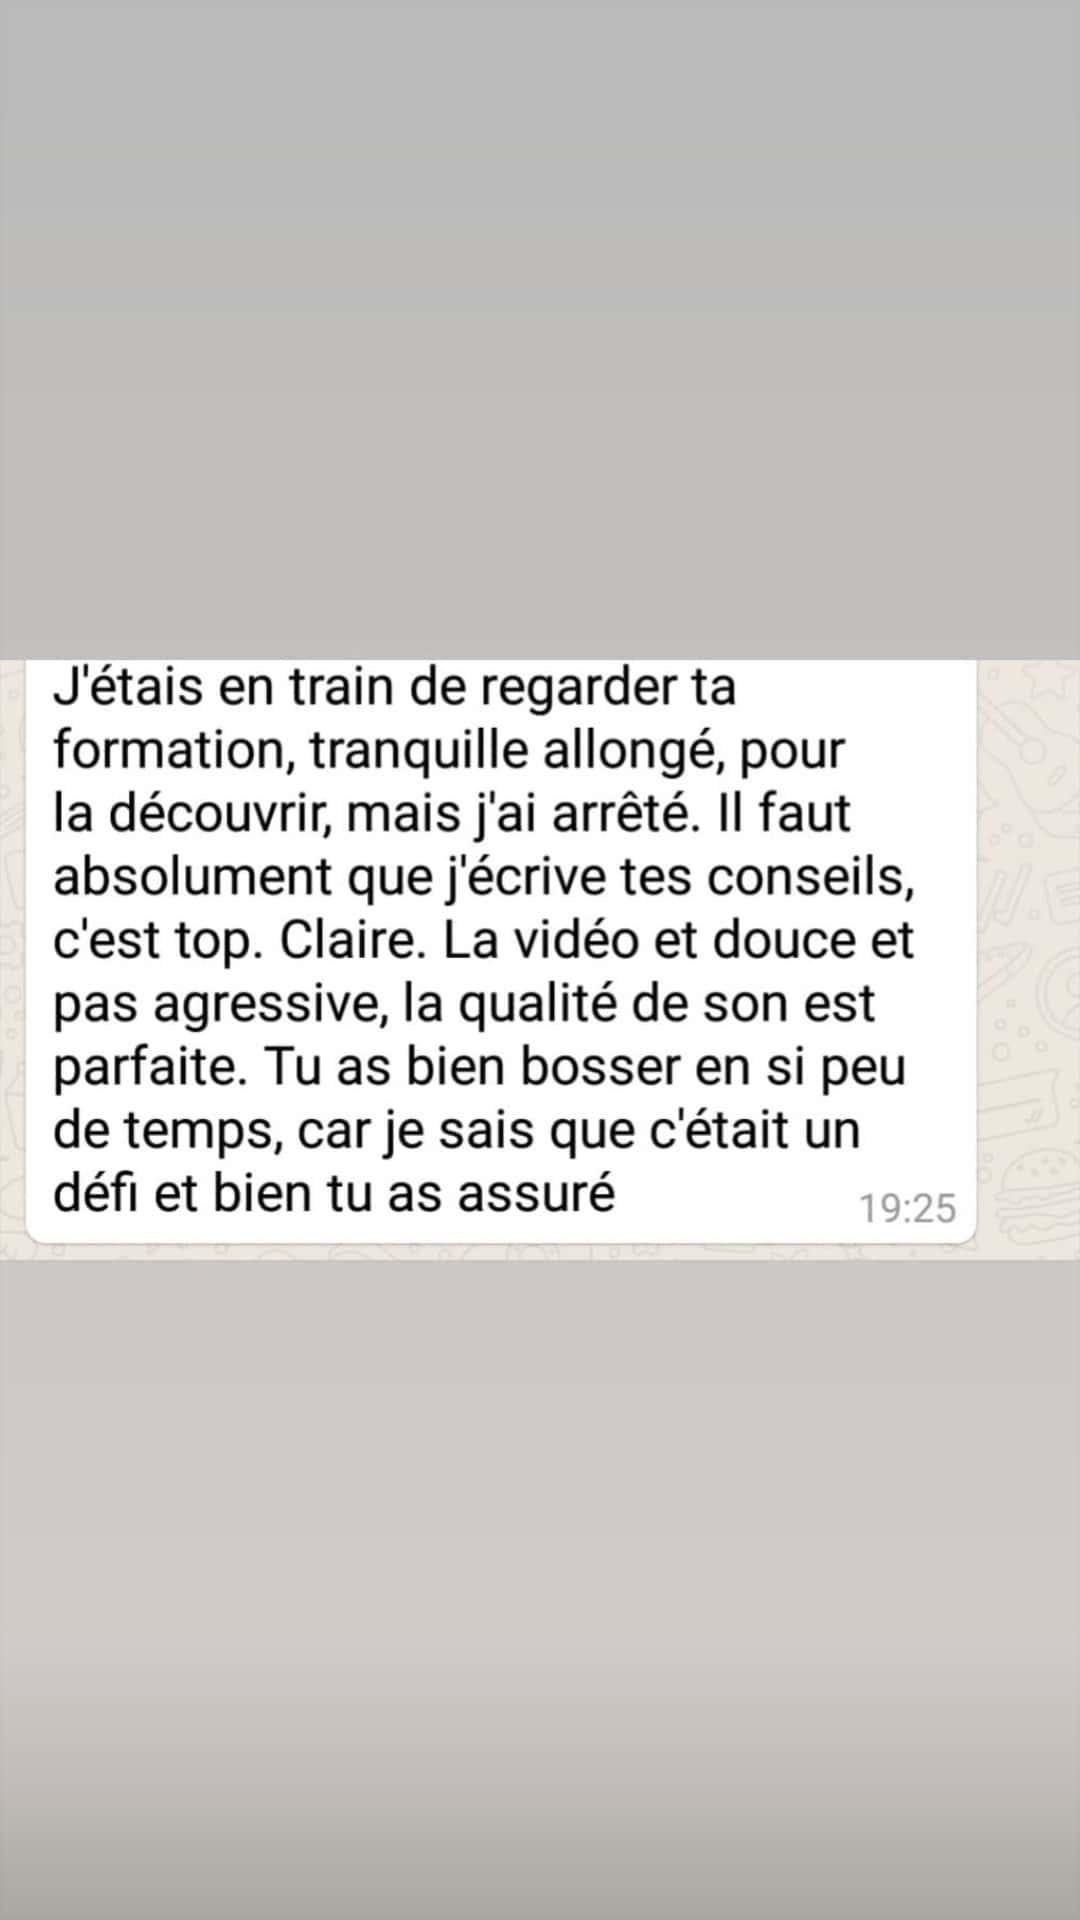 Avis-Les-Reines-Affiliation_20200605_084456